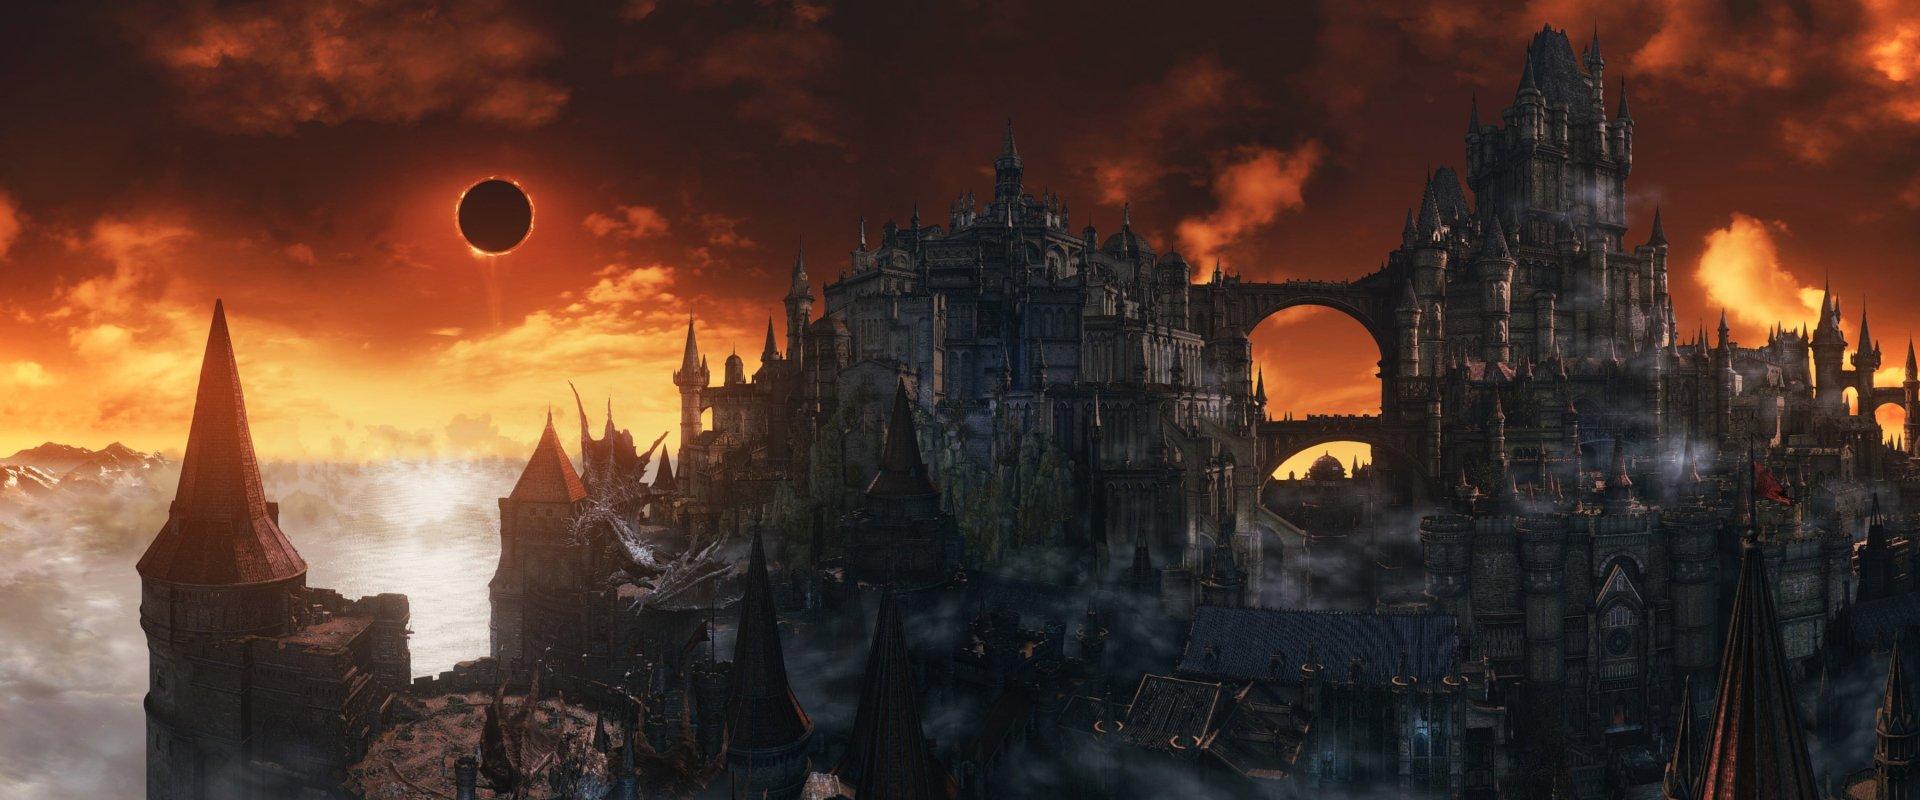 Dark Souls III HD Wallpaper | Background Image | 3600x1500 ...